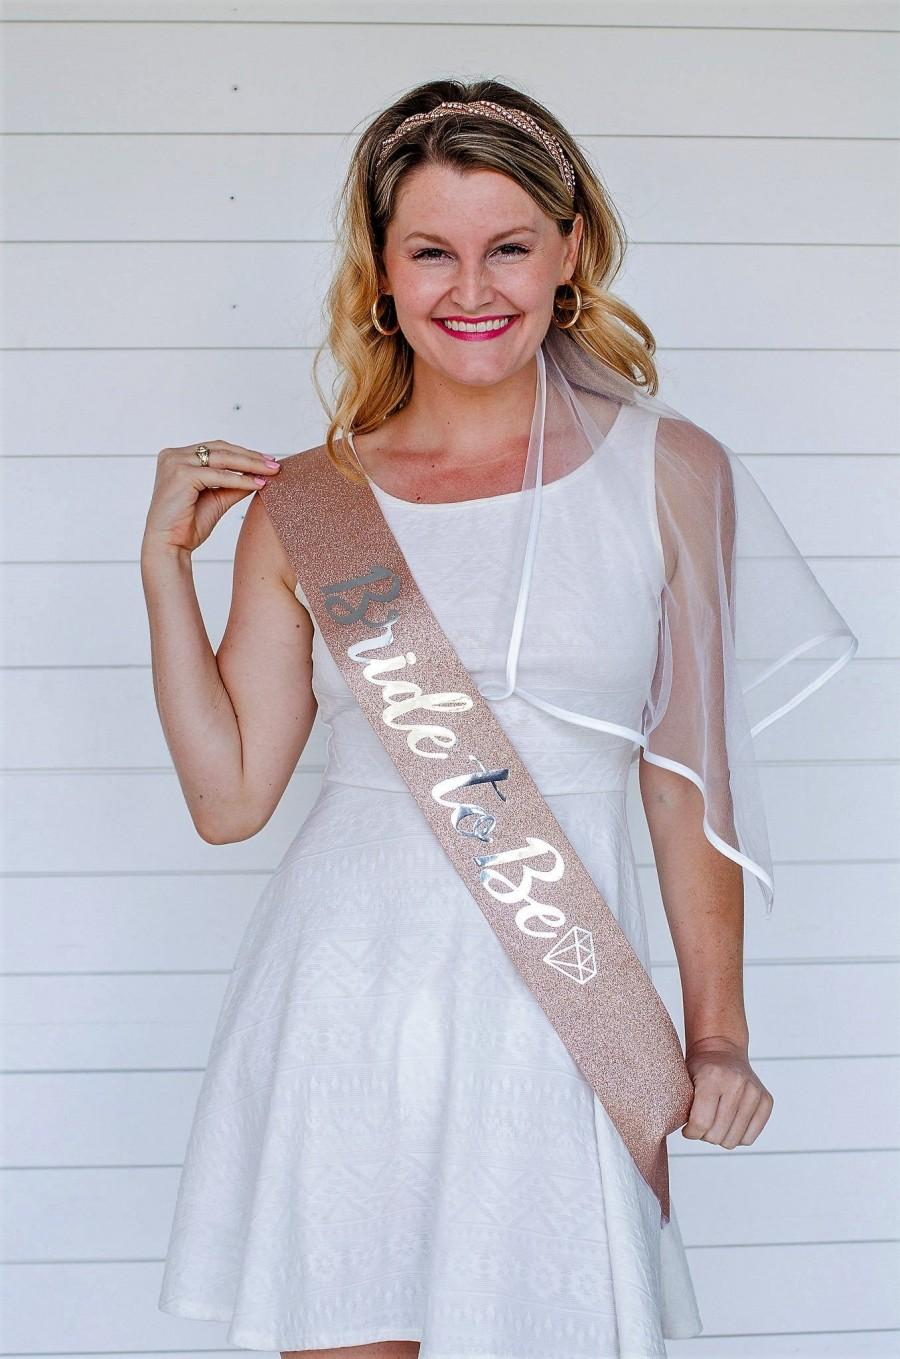 Mariage - Bachelorette Party Sash - Bride to Be Sash - Rose Gold - Silver - Bachelorette Party Decorations - Premium Glitter Sash - Bride Gift